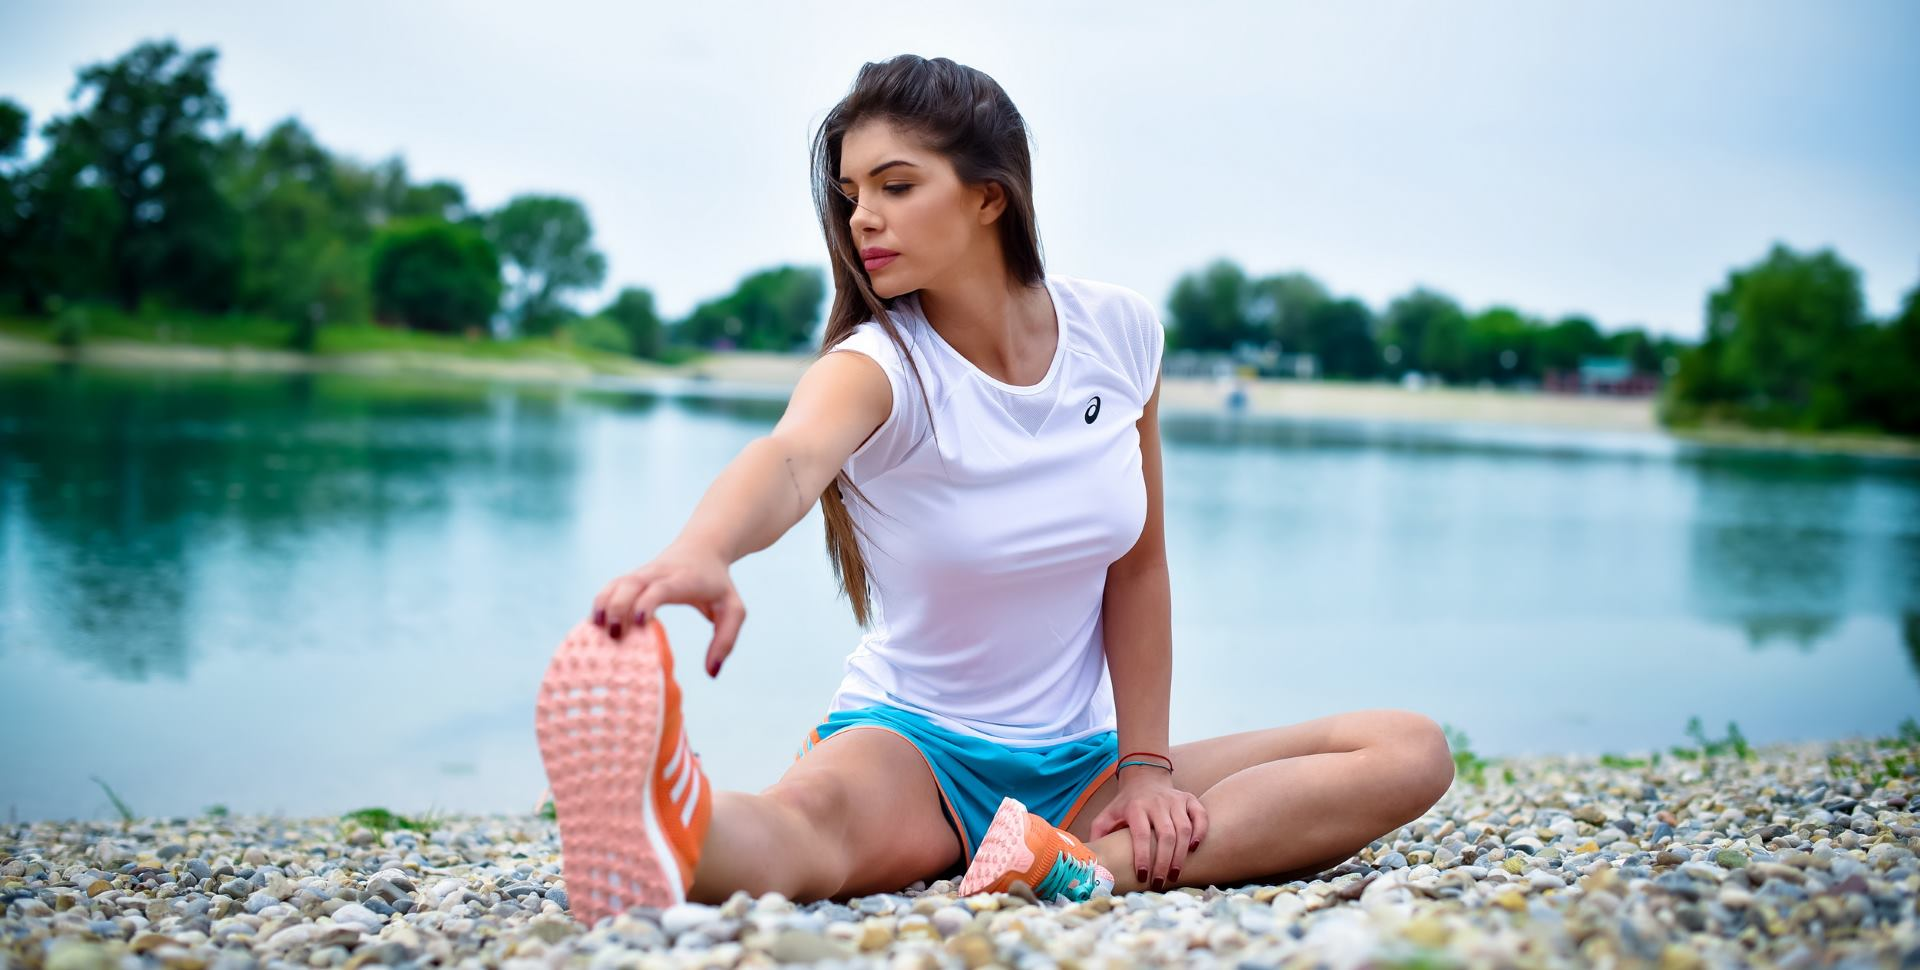 FOTO: Iva Šarić Leko obožava trčanje i koncept 42.2 Running Storea